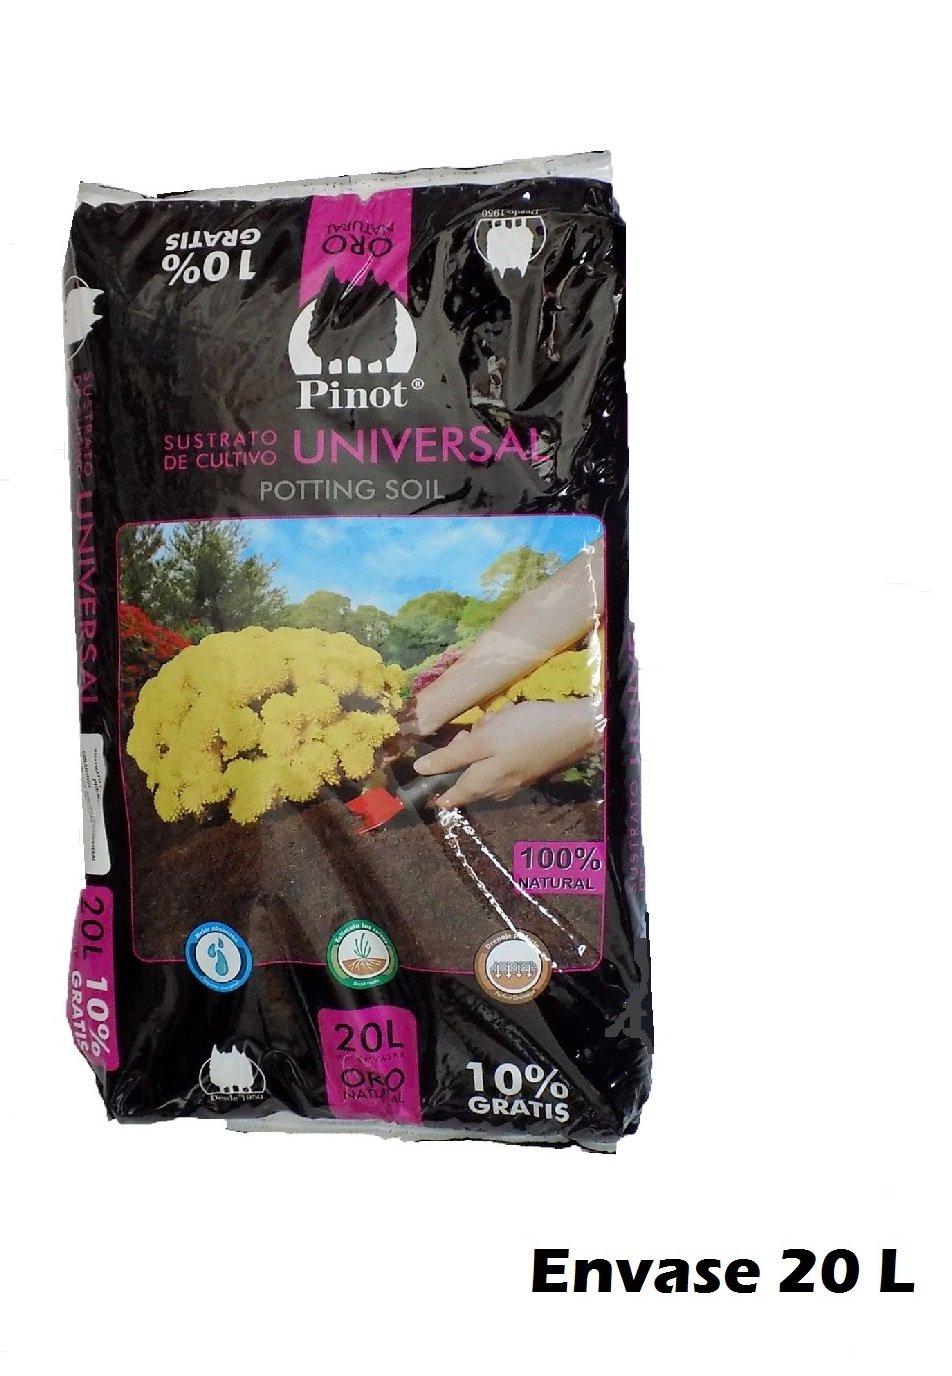 Turba sustrato de Cultivo Humus Corteza Pino 20 L substrato Pinot Premium: Amazon.es: Deportes y aire libre